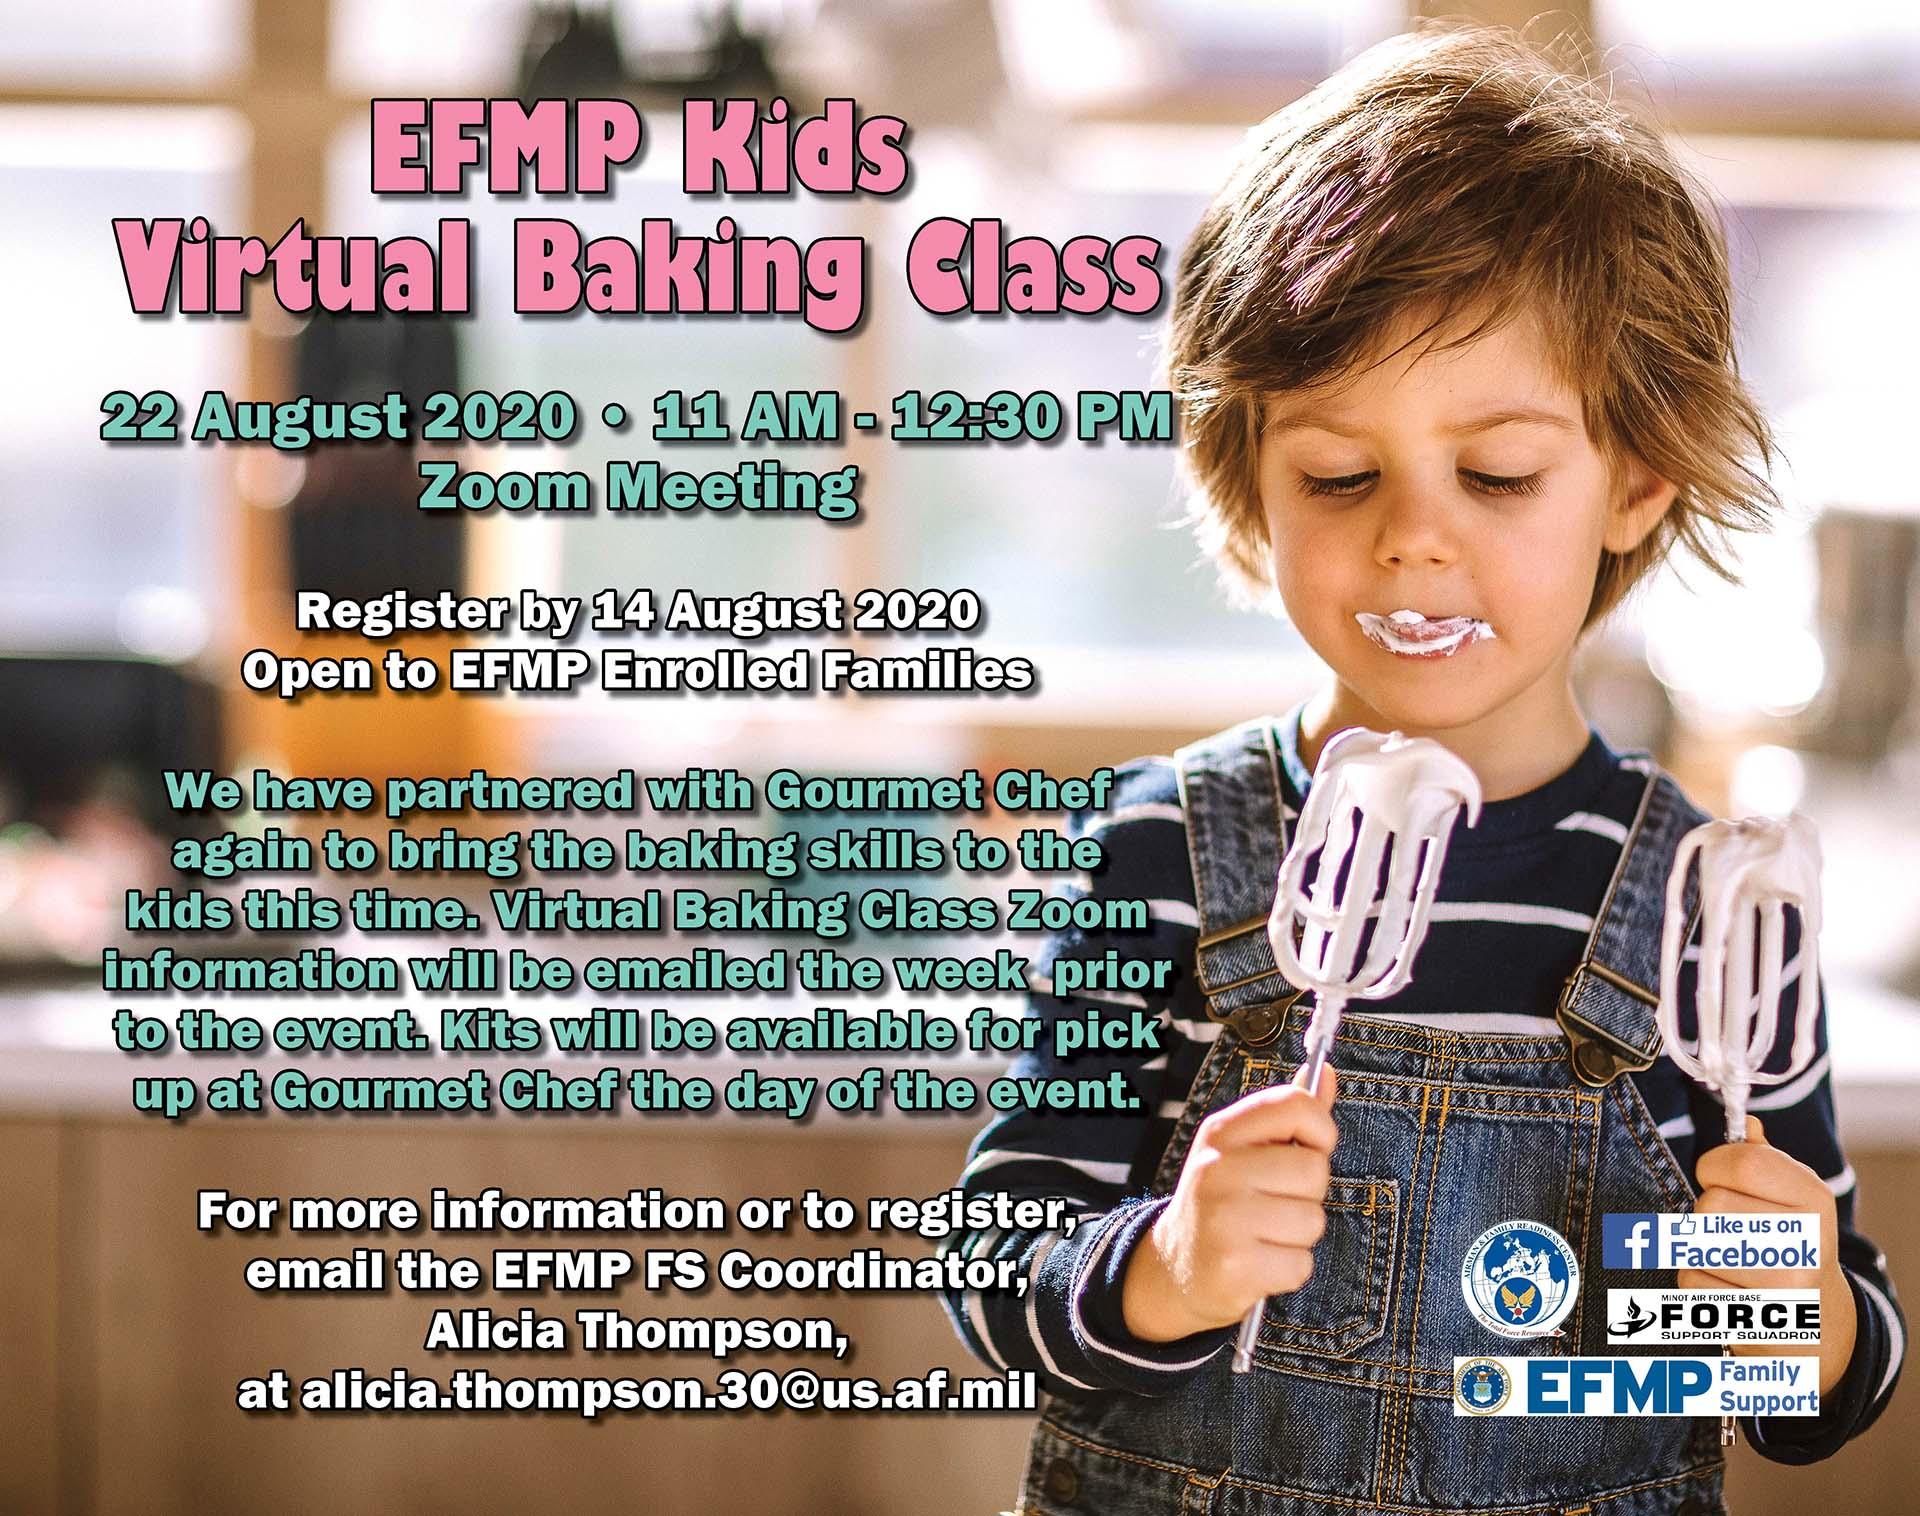 EFMP Kids Virtual Baking Class